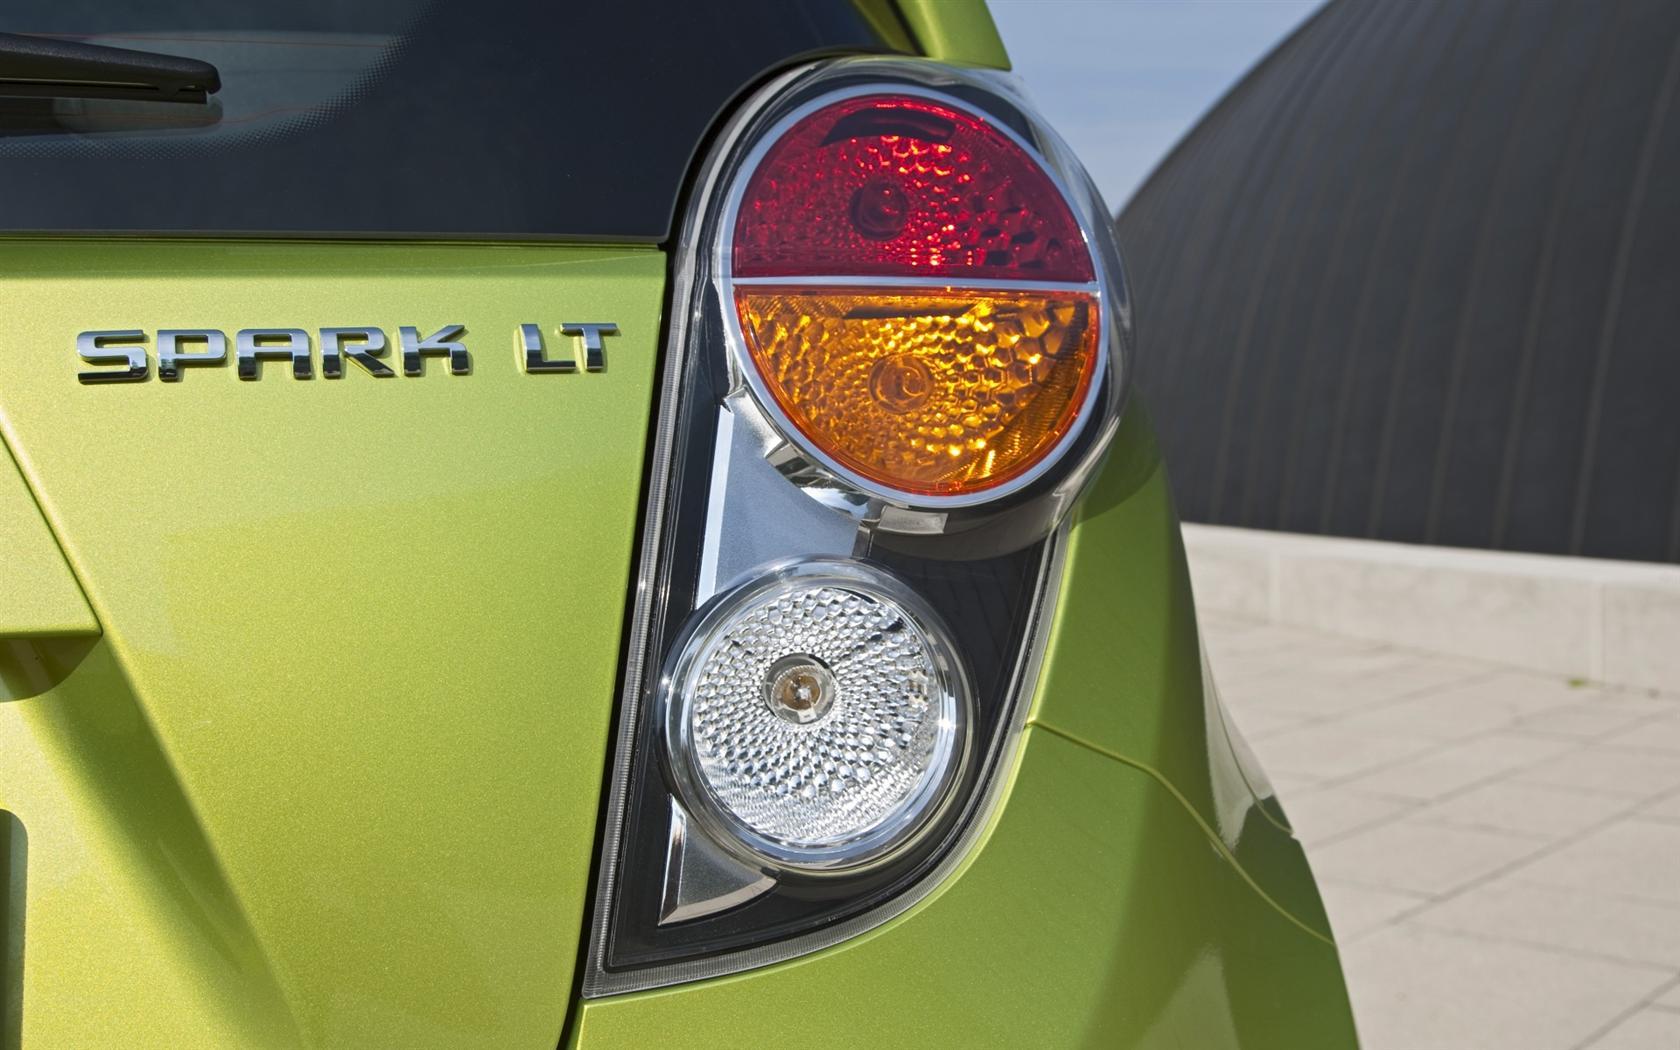 2011 Chevrolet Spark Image